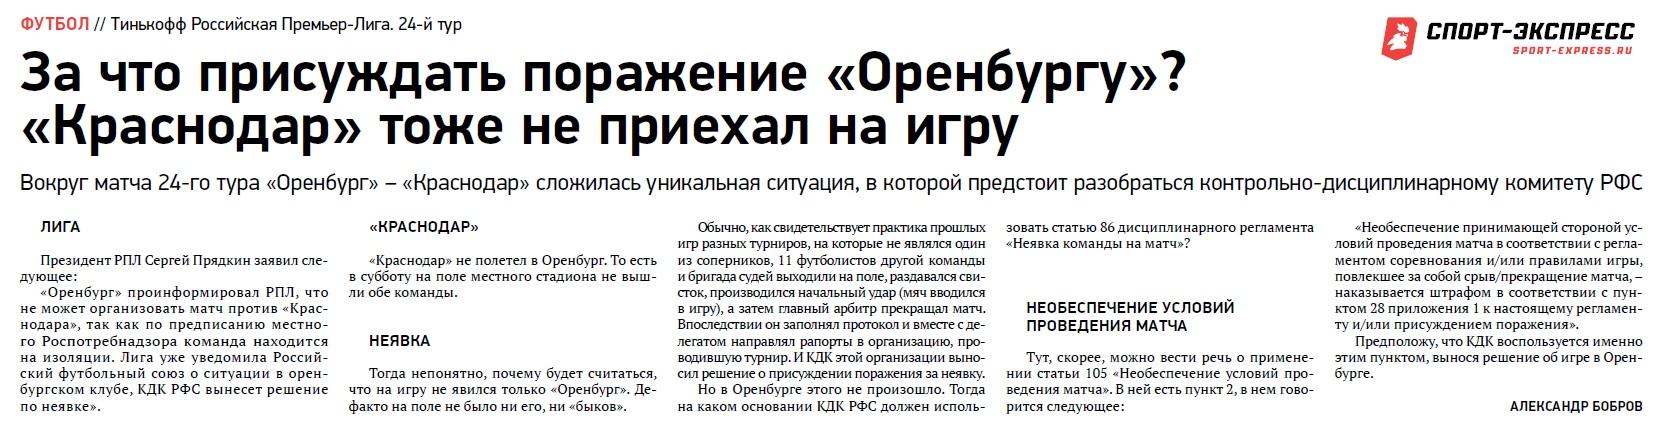 Оренбург (Оренбург) - Краснодар (Краснодар) -:+ тех.. Нажмите, чтобы посмотреть истинный размер рисунка